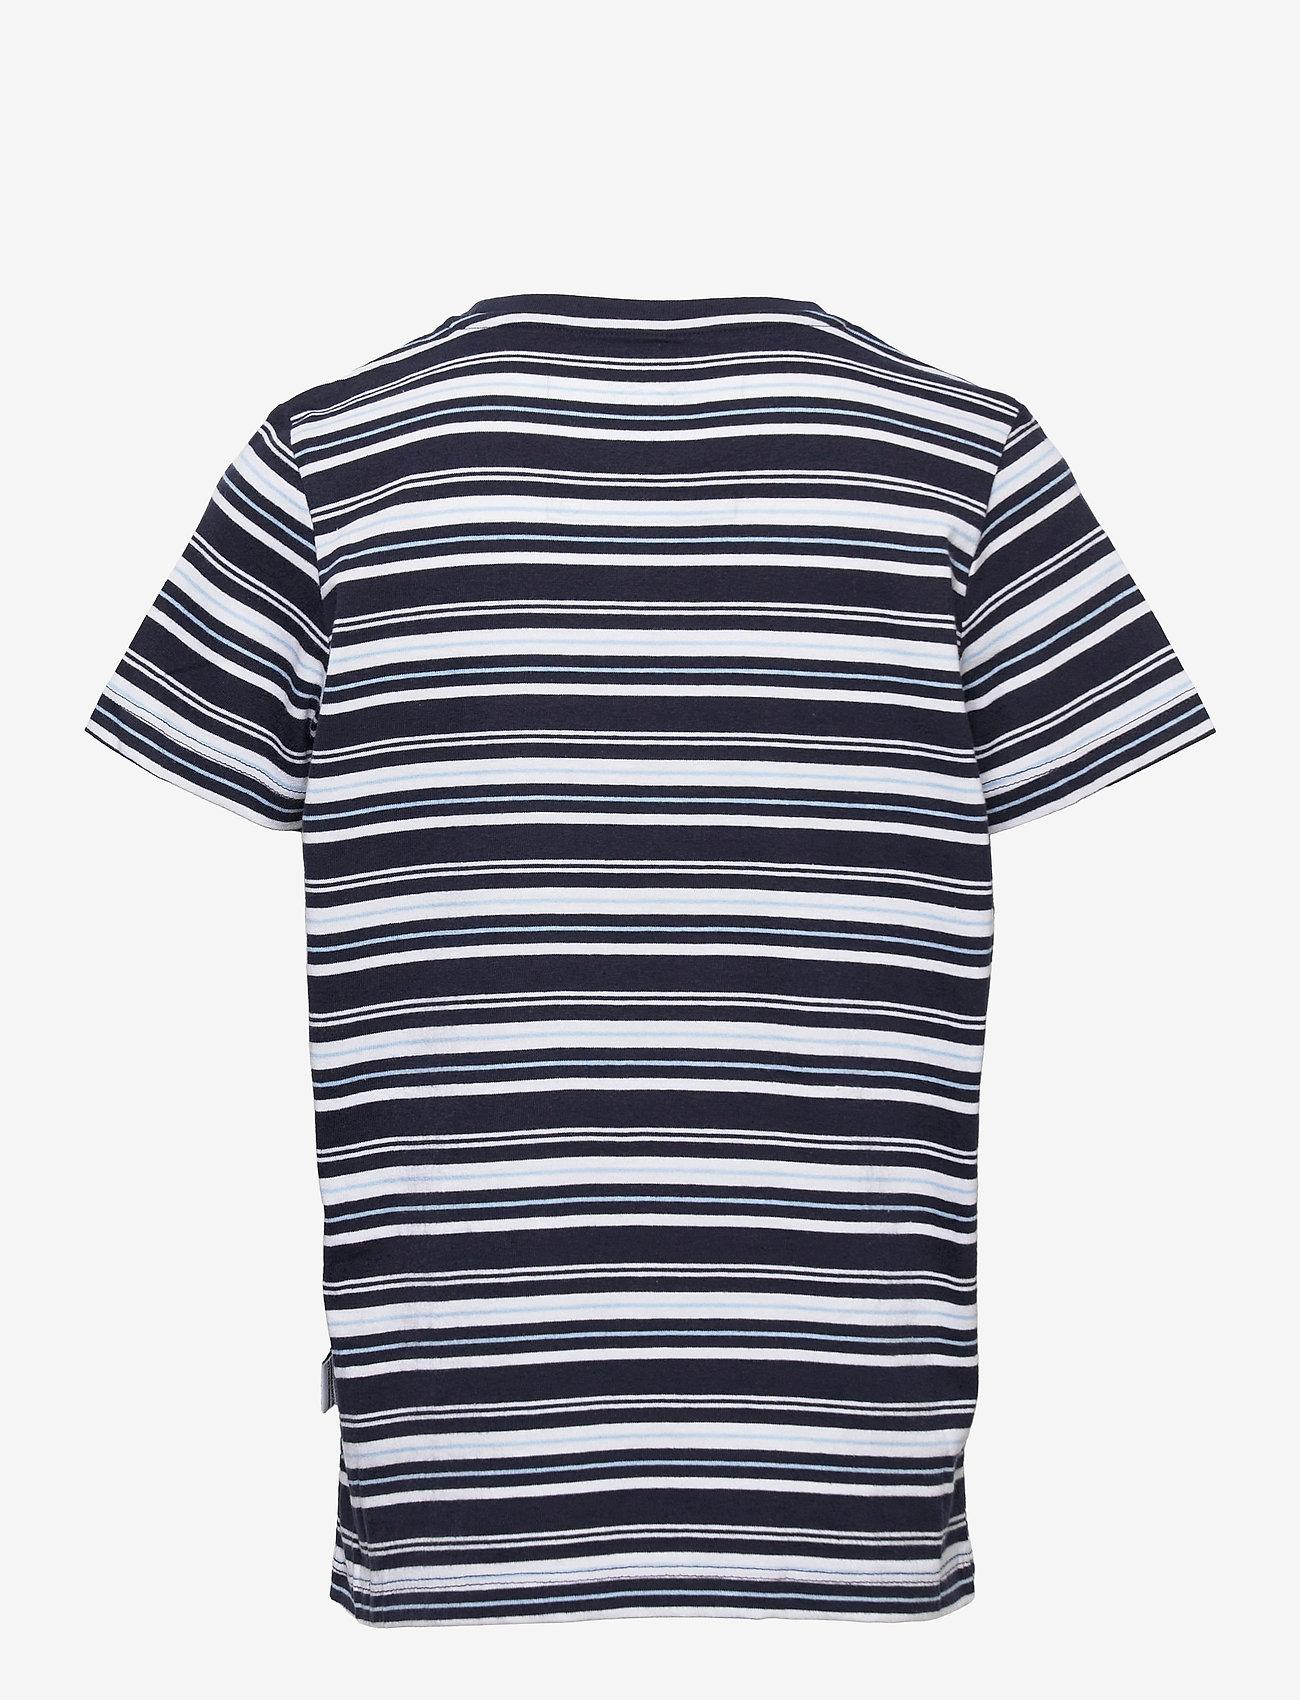 Kronstadt - Halfdan Recycled - short-sleeved - navy/lt.blue/white - 1